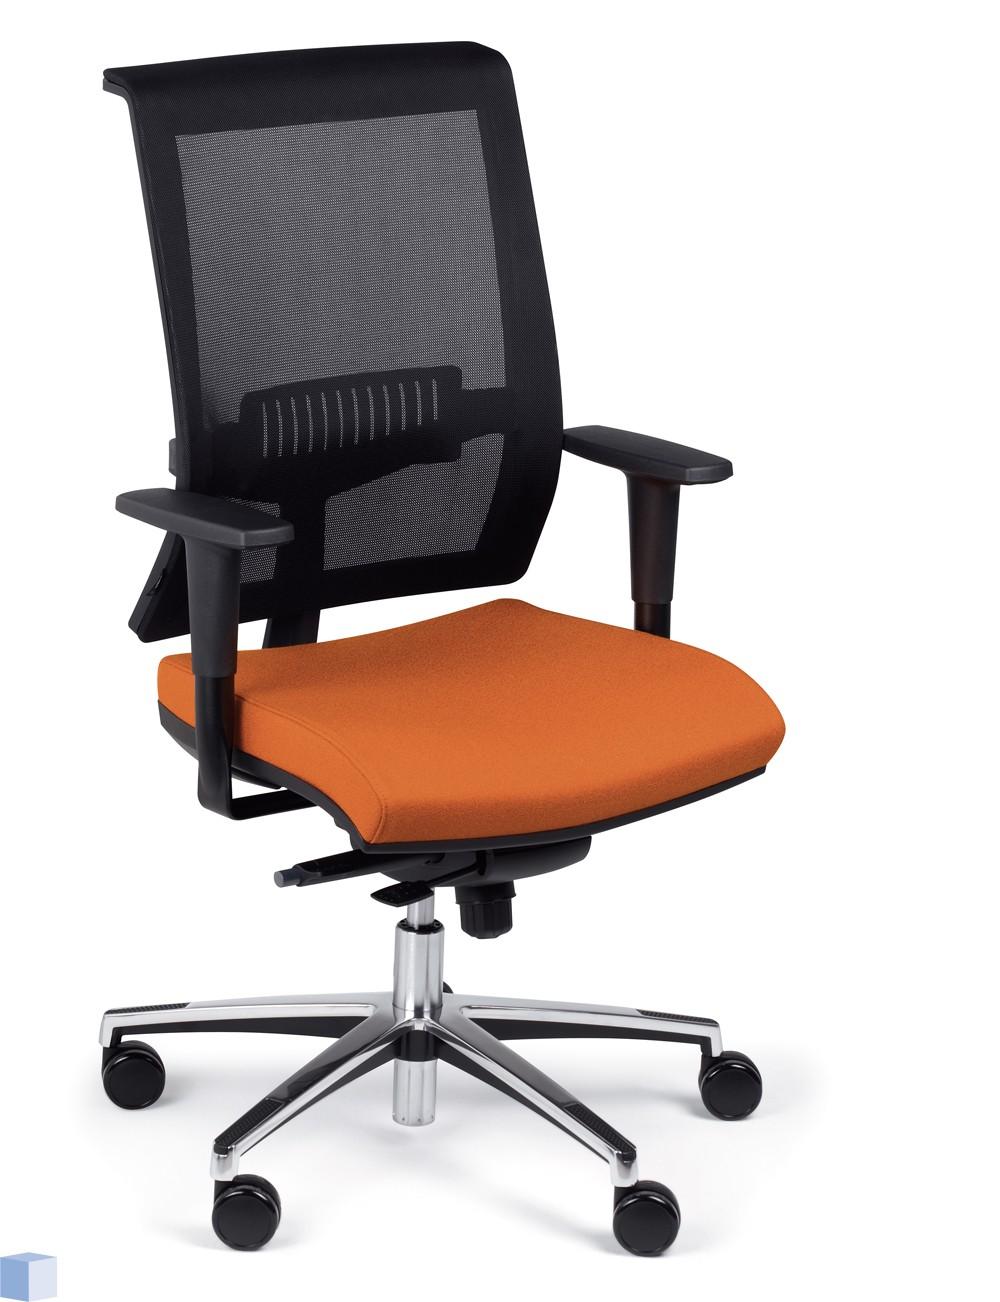 B ta bureaustoel volendam for Bureau stoel